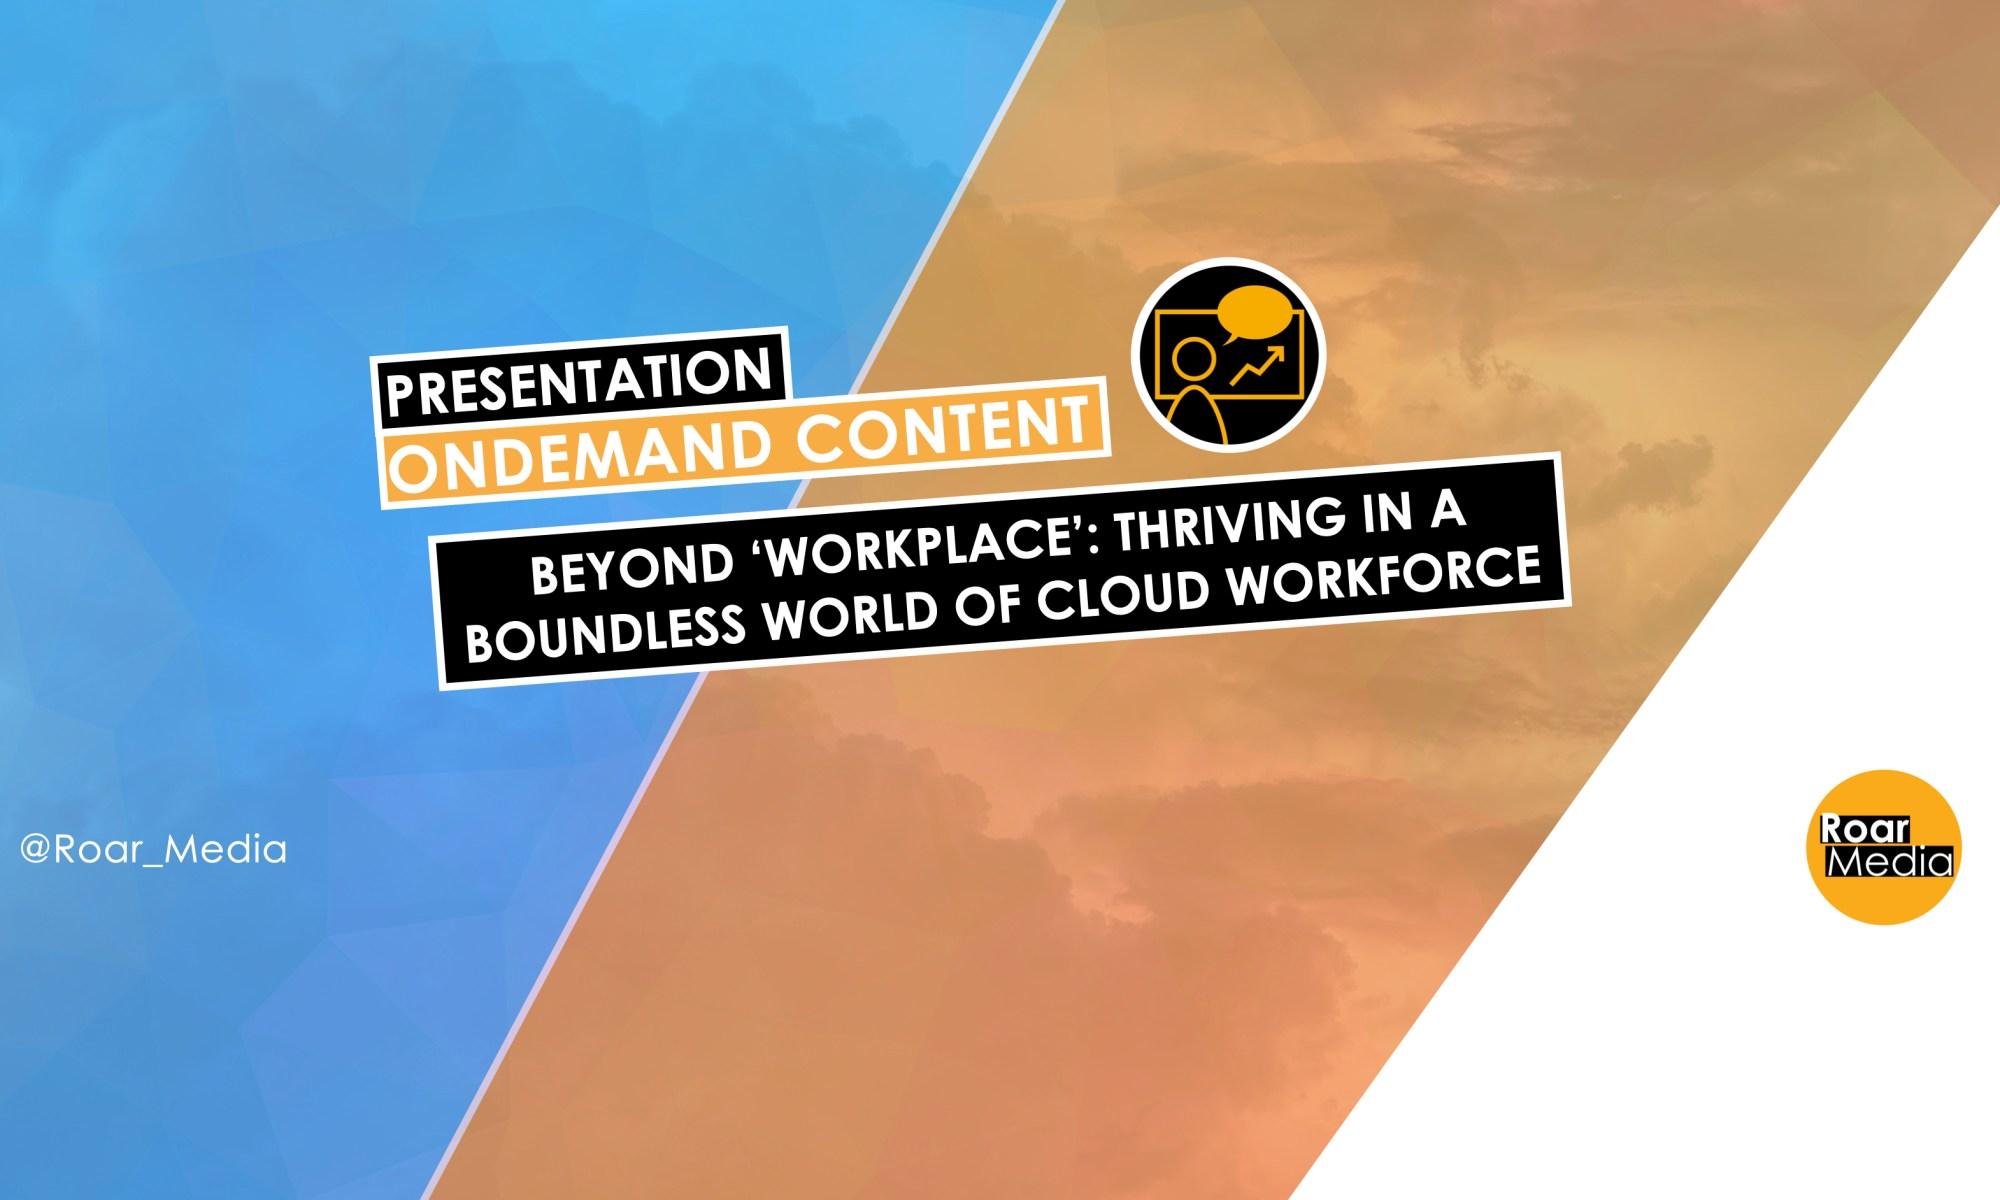 Michael Wheeler Wyatt presented at the Online Digital Transformation Conference